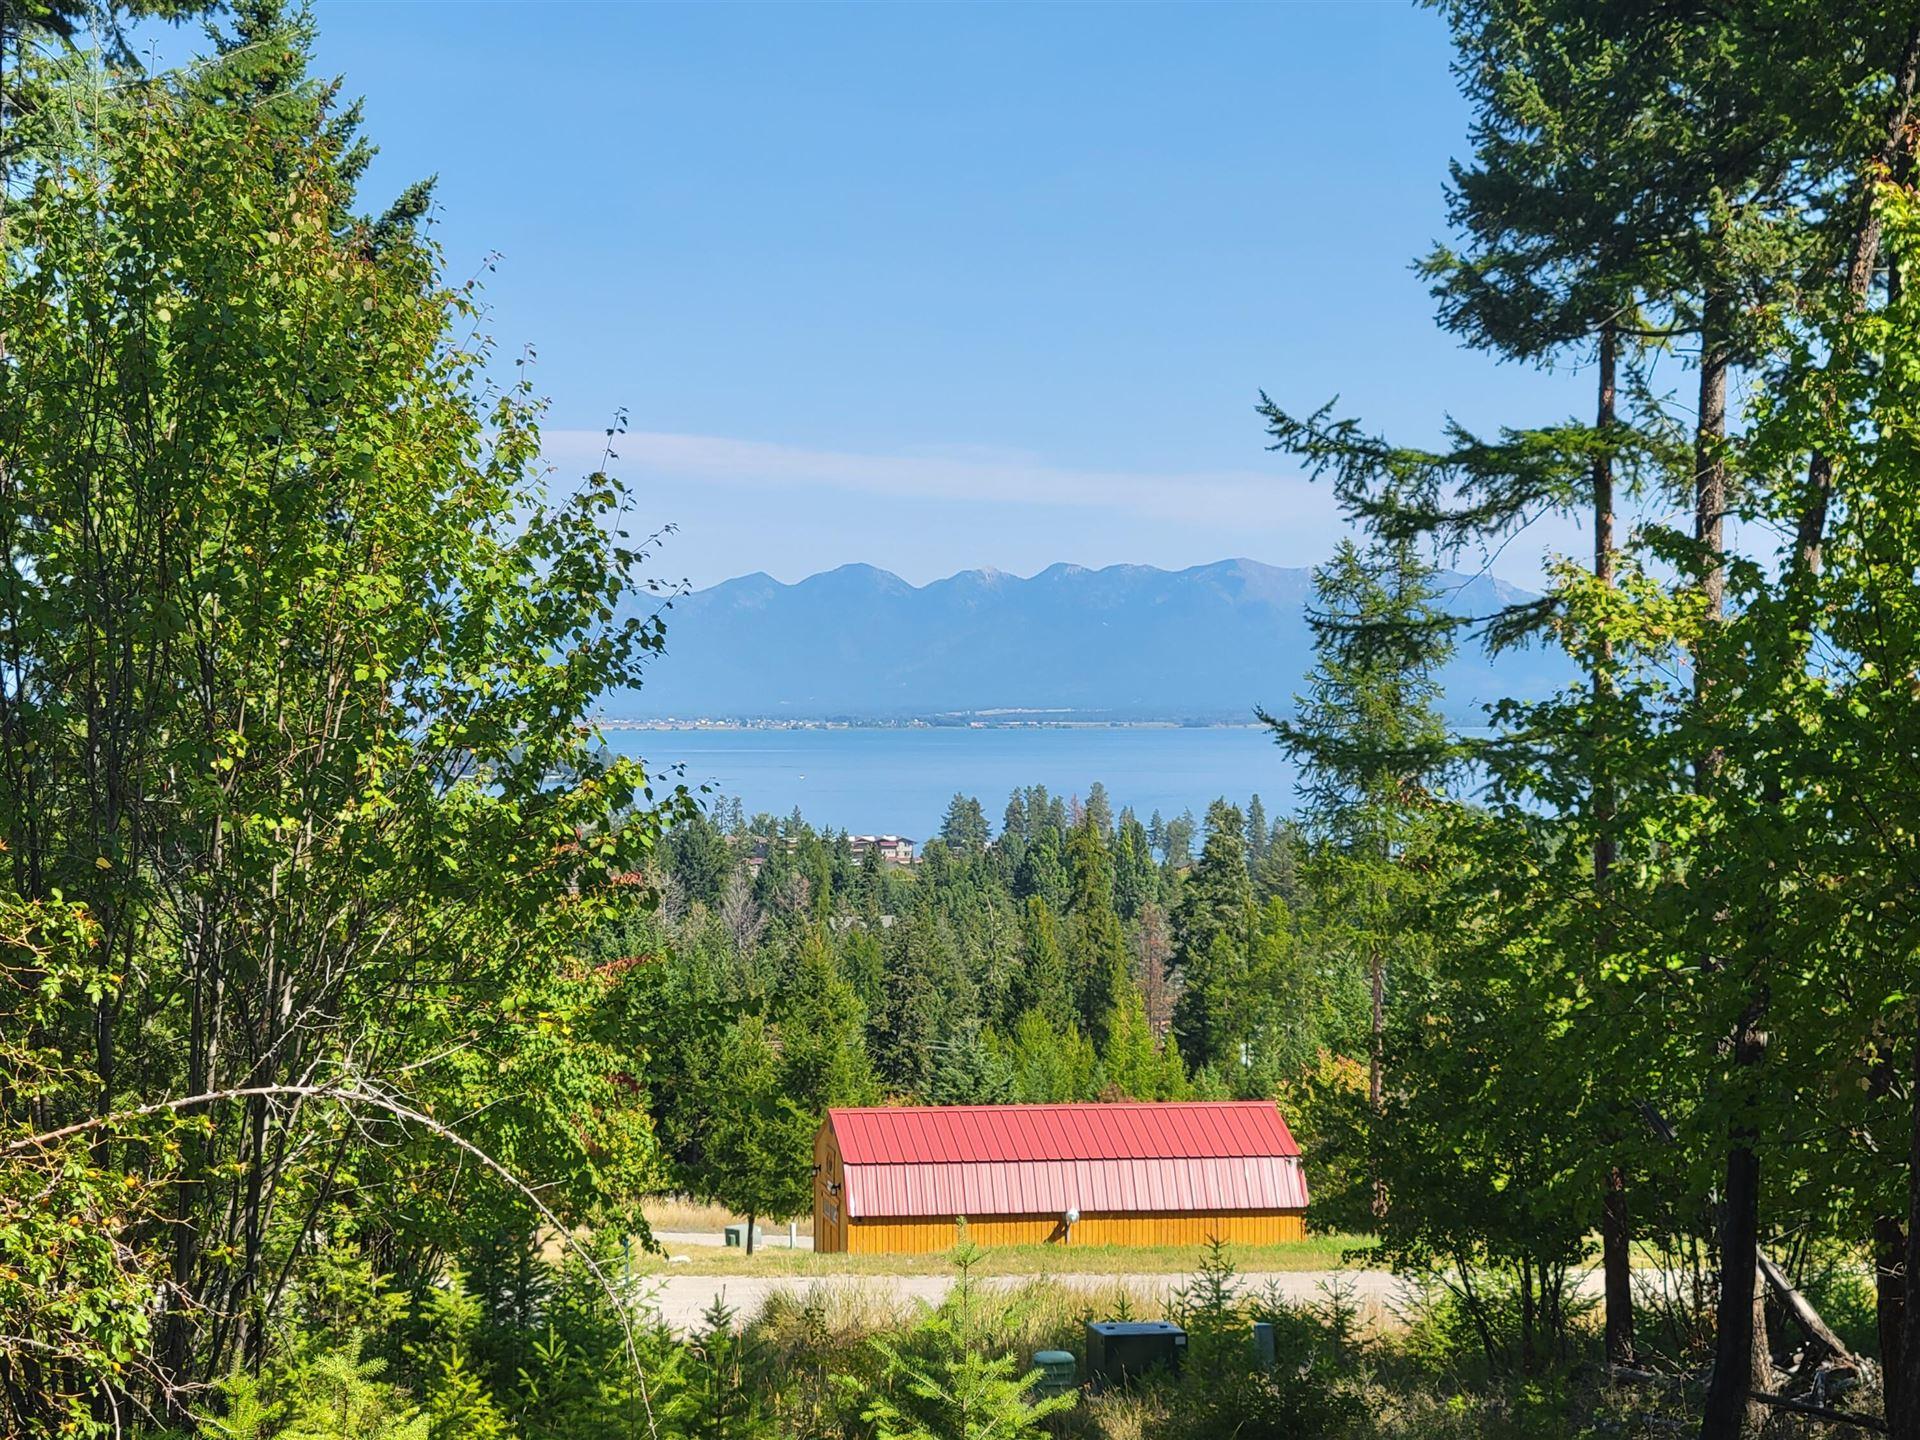 Photo for 156 Monet Road, Lakeside, MT 59922 (MLS # 22111748)